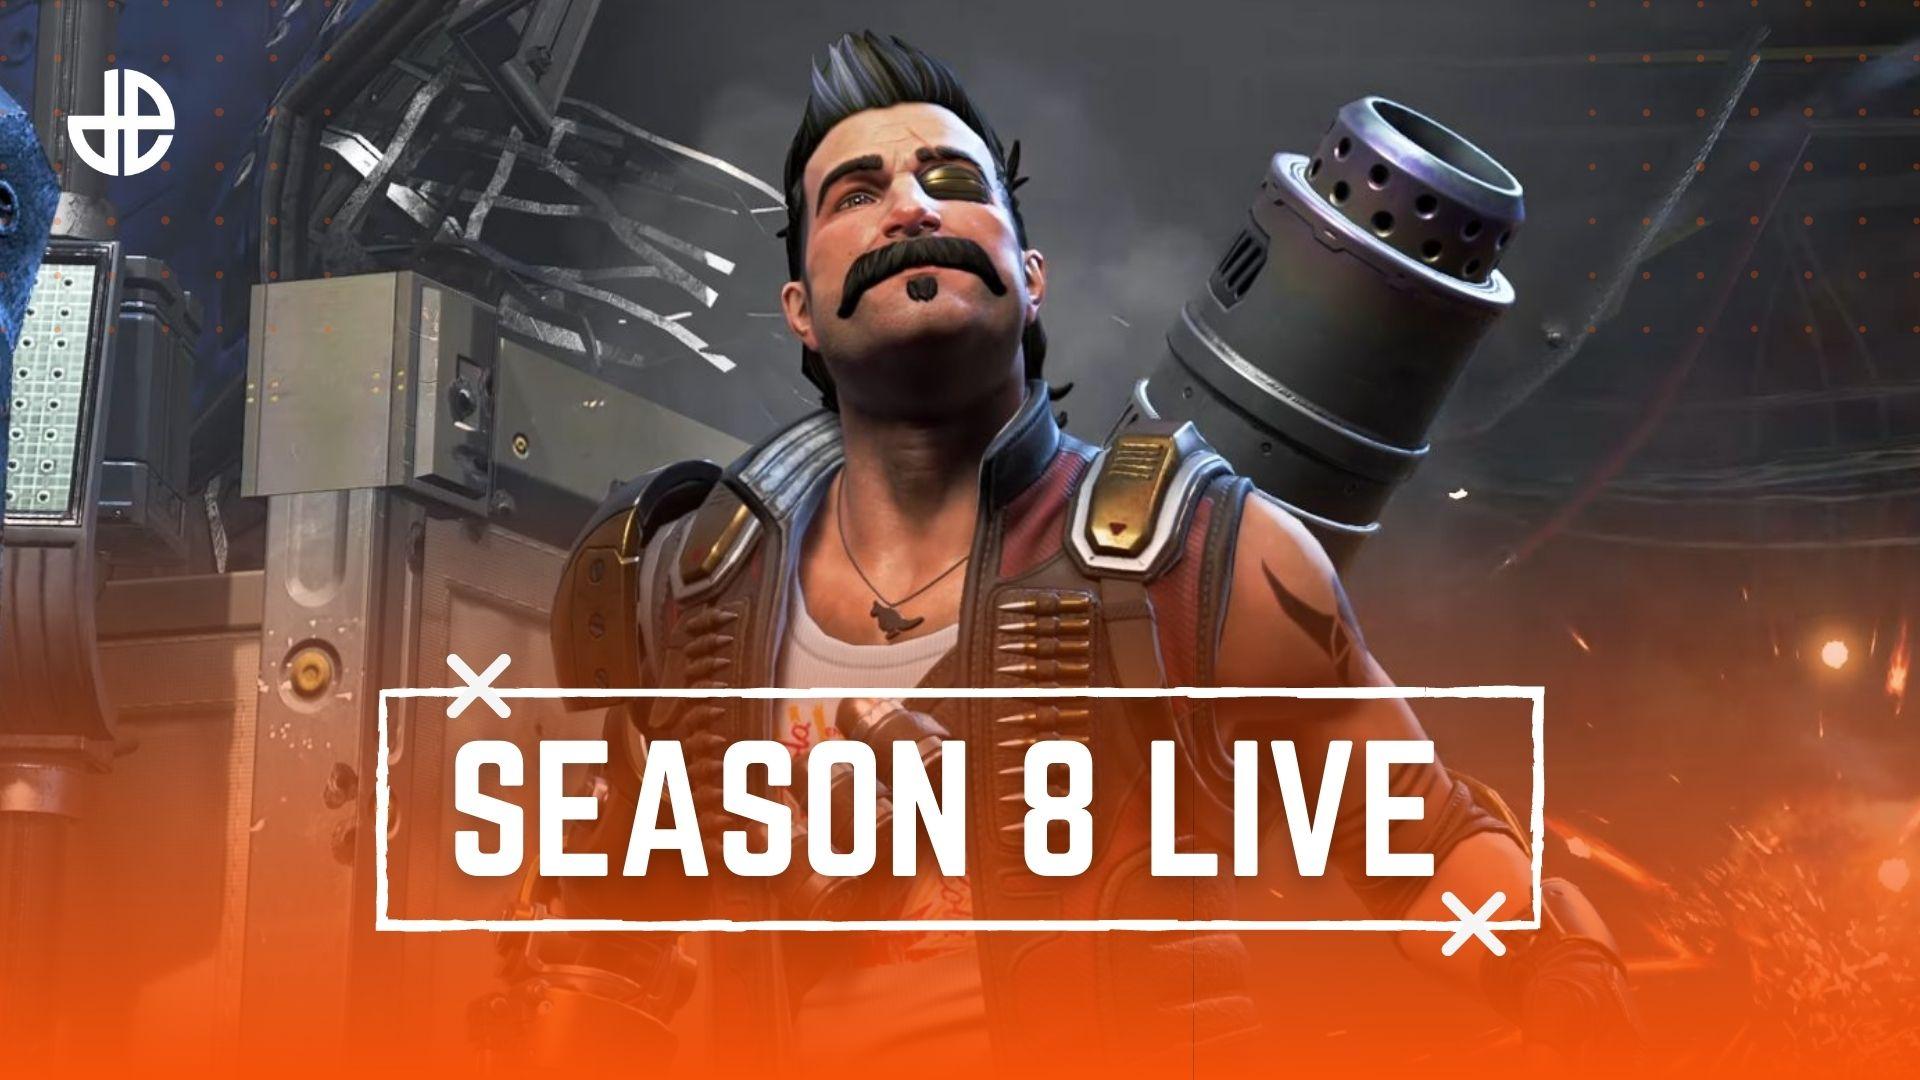 Apex Legends season 8 live blog